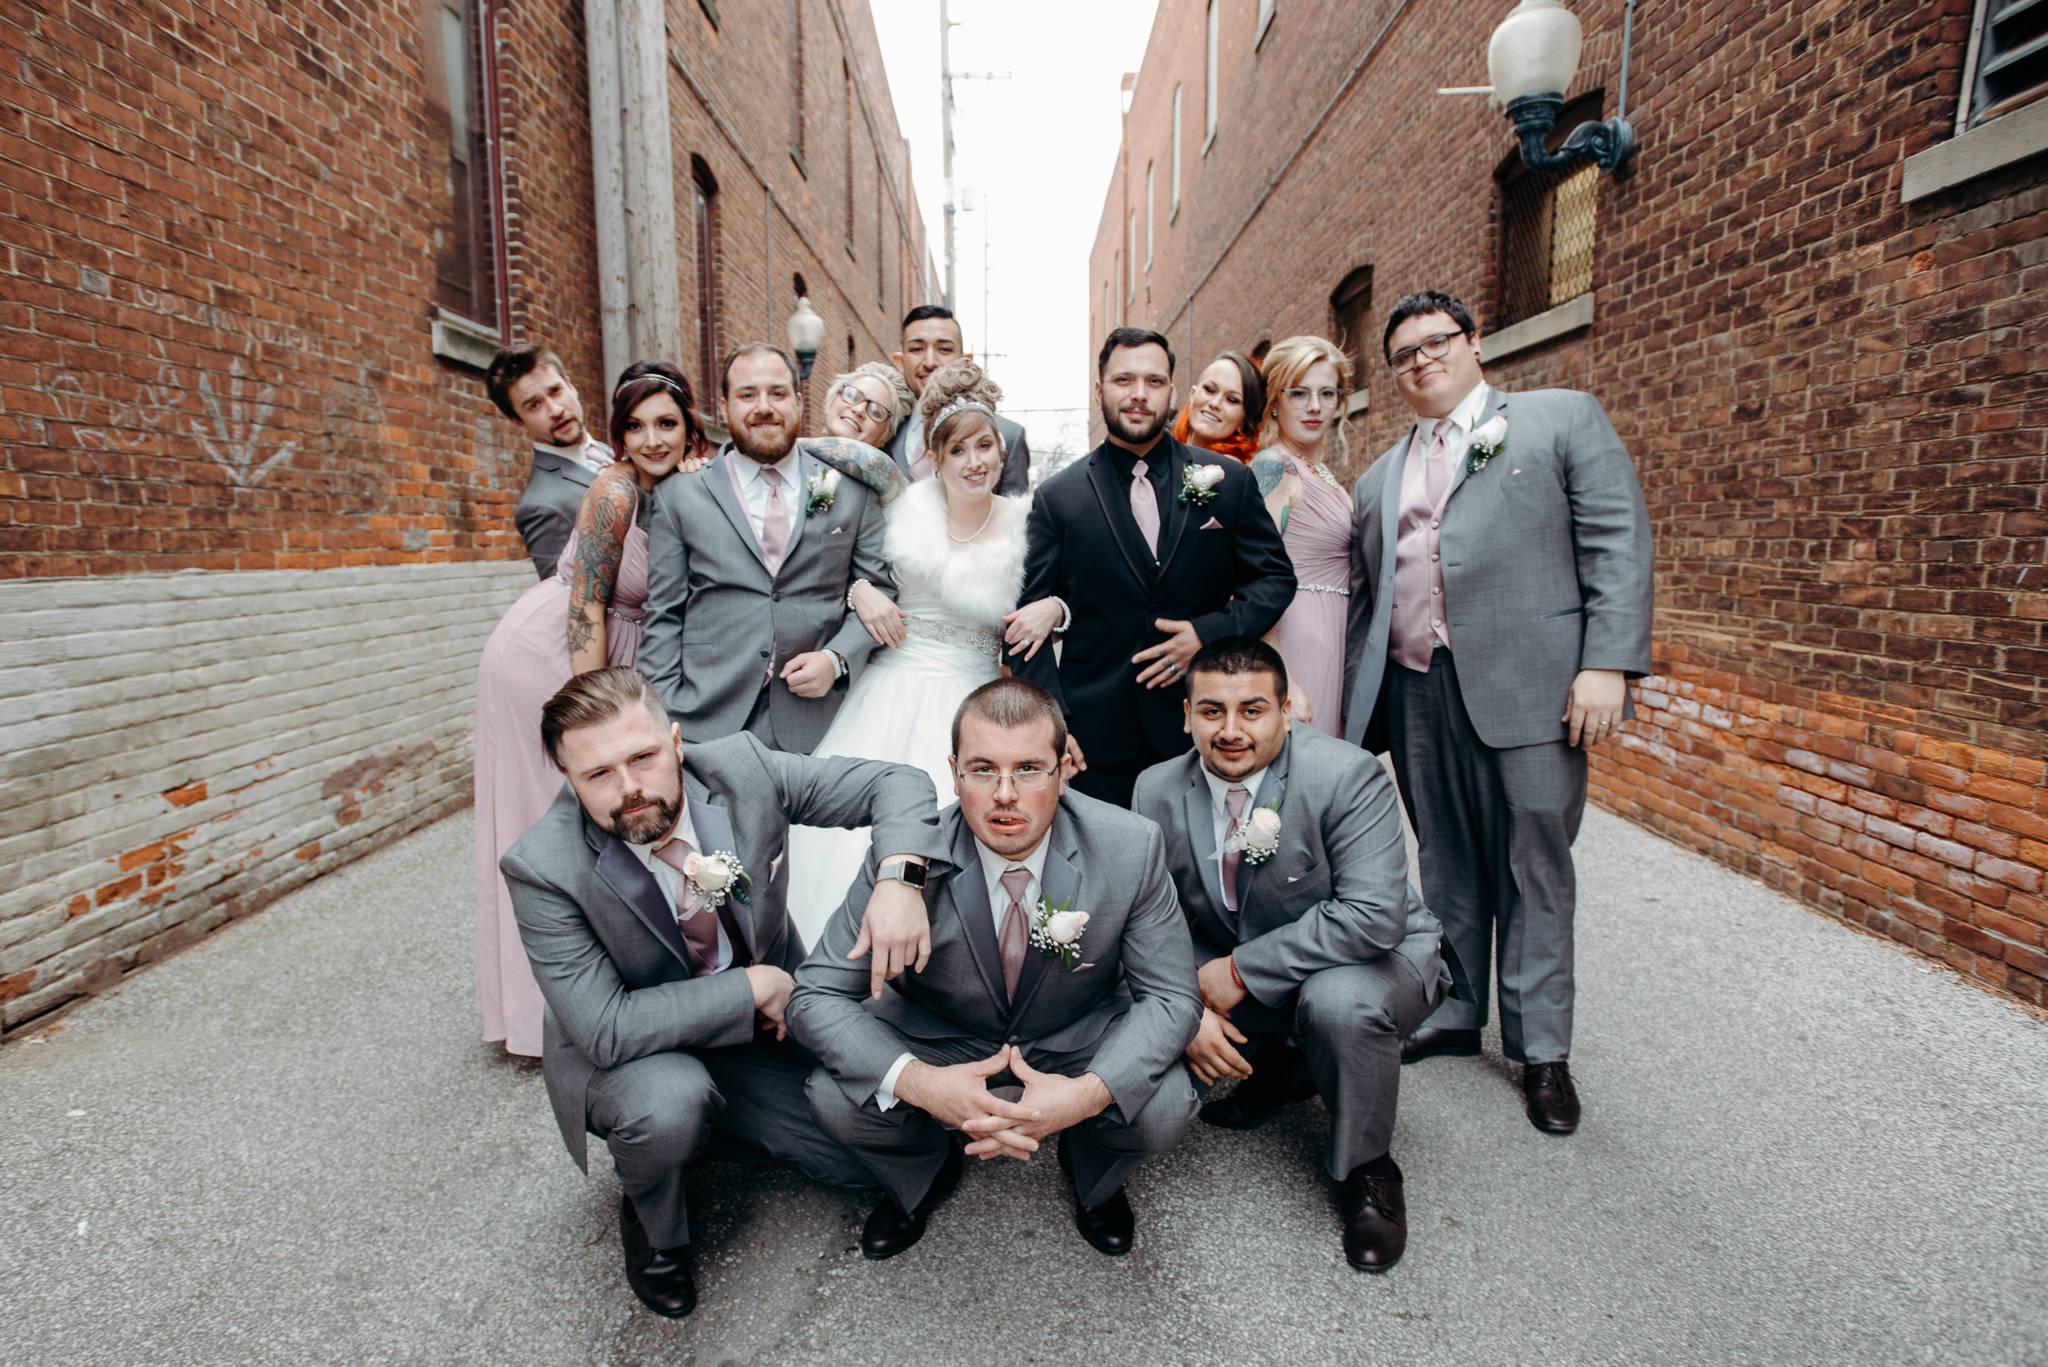 Grant Beachy Photo portrait wedding goshen elkhart south bend chicago-037.jpg